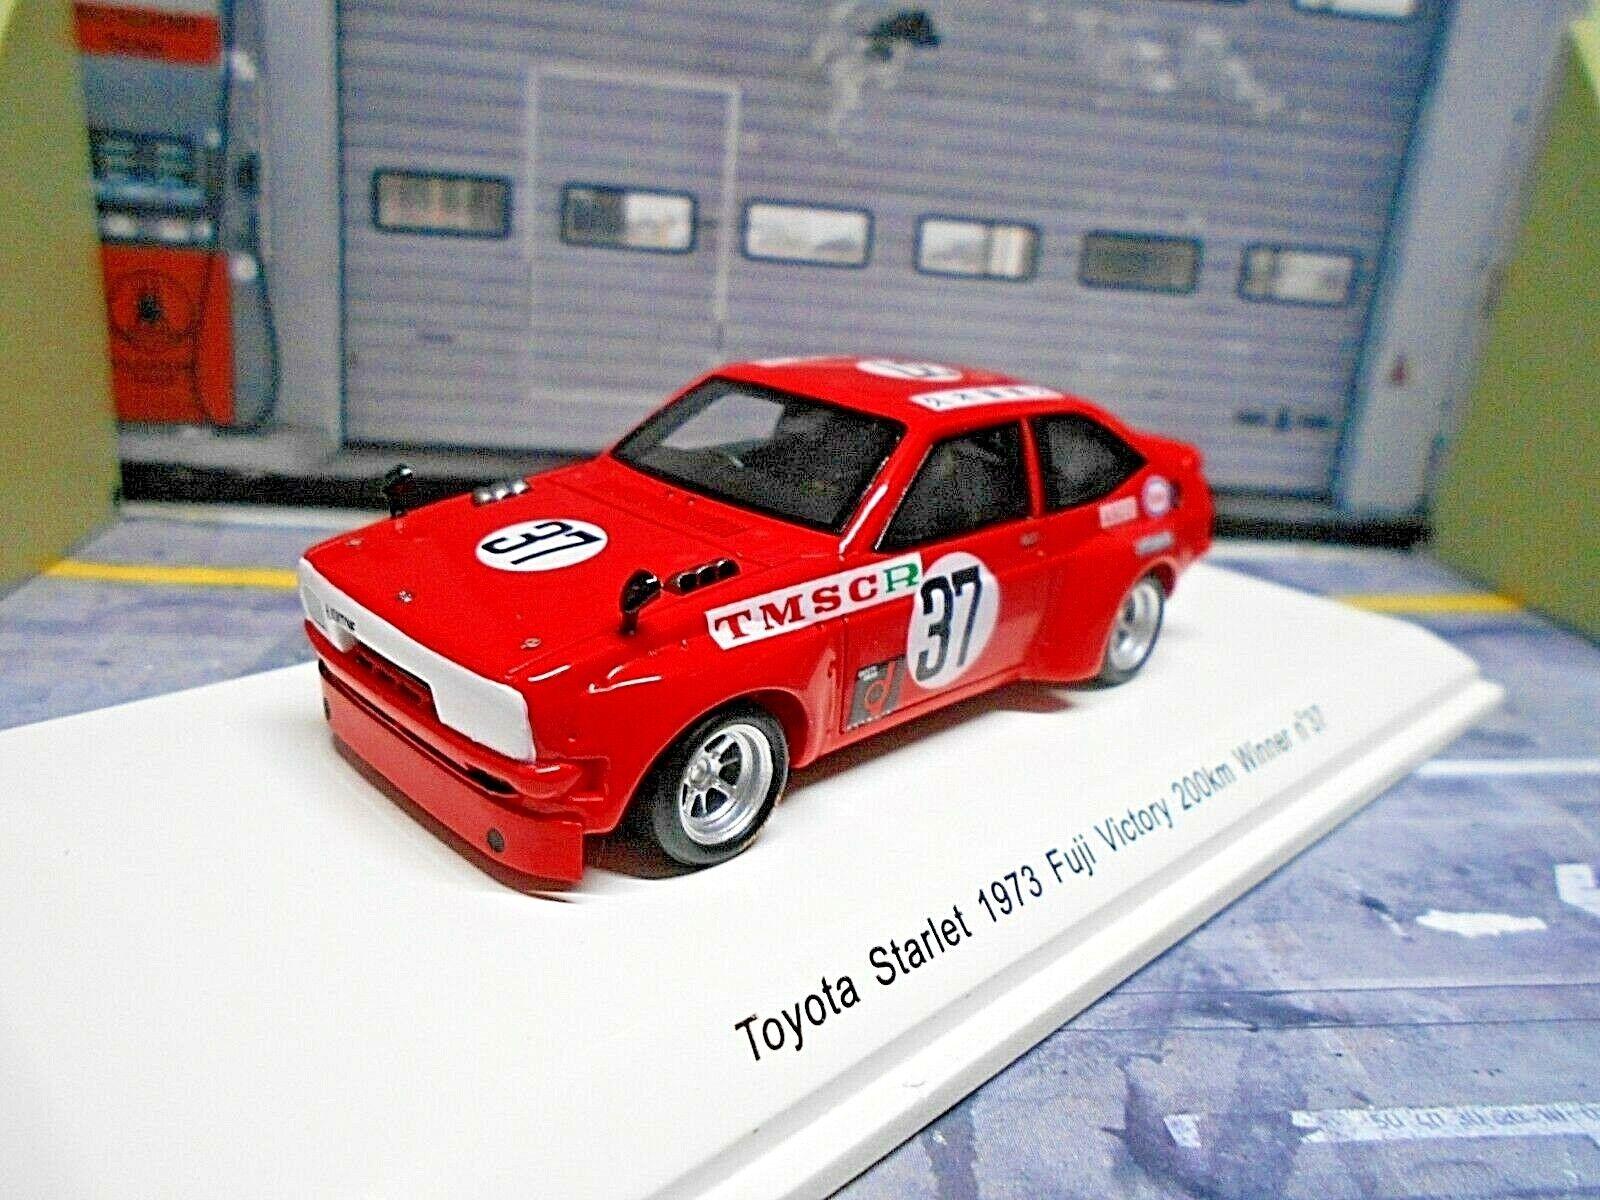 Toyota Starlet trajet Voiture taille 5 1973  37 kukitome Winner Spark SP rêve 1 43